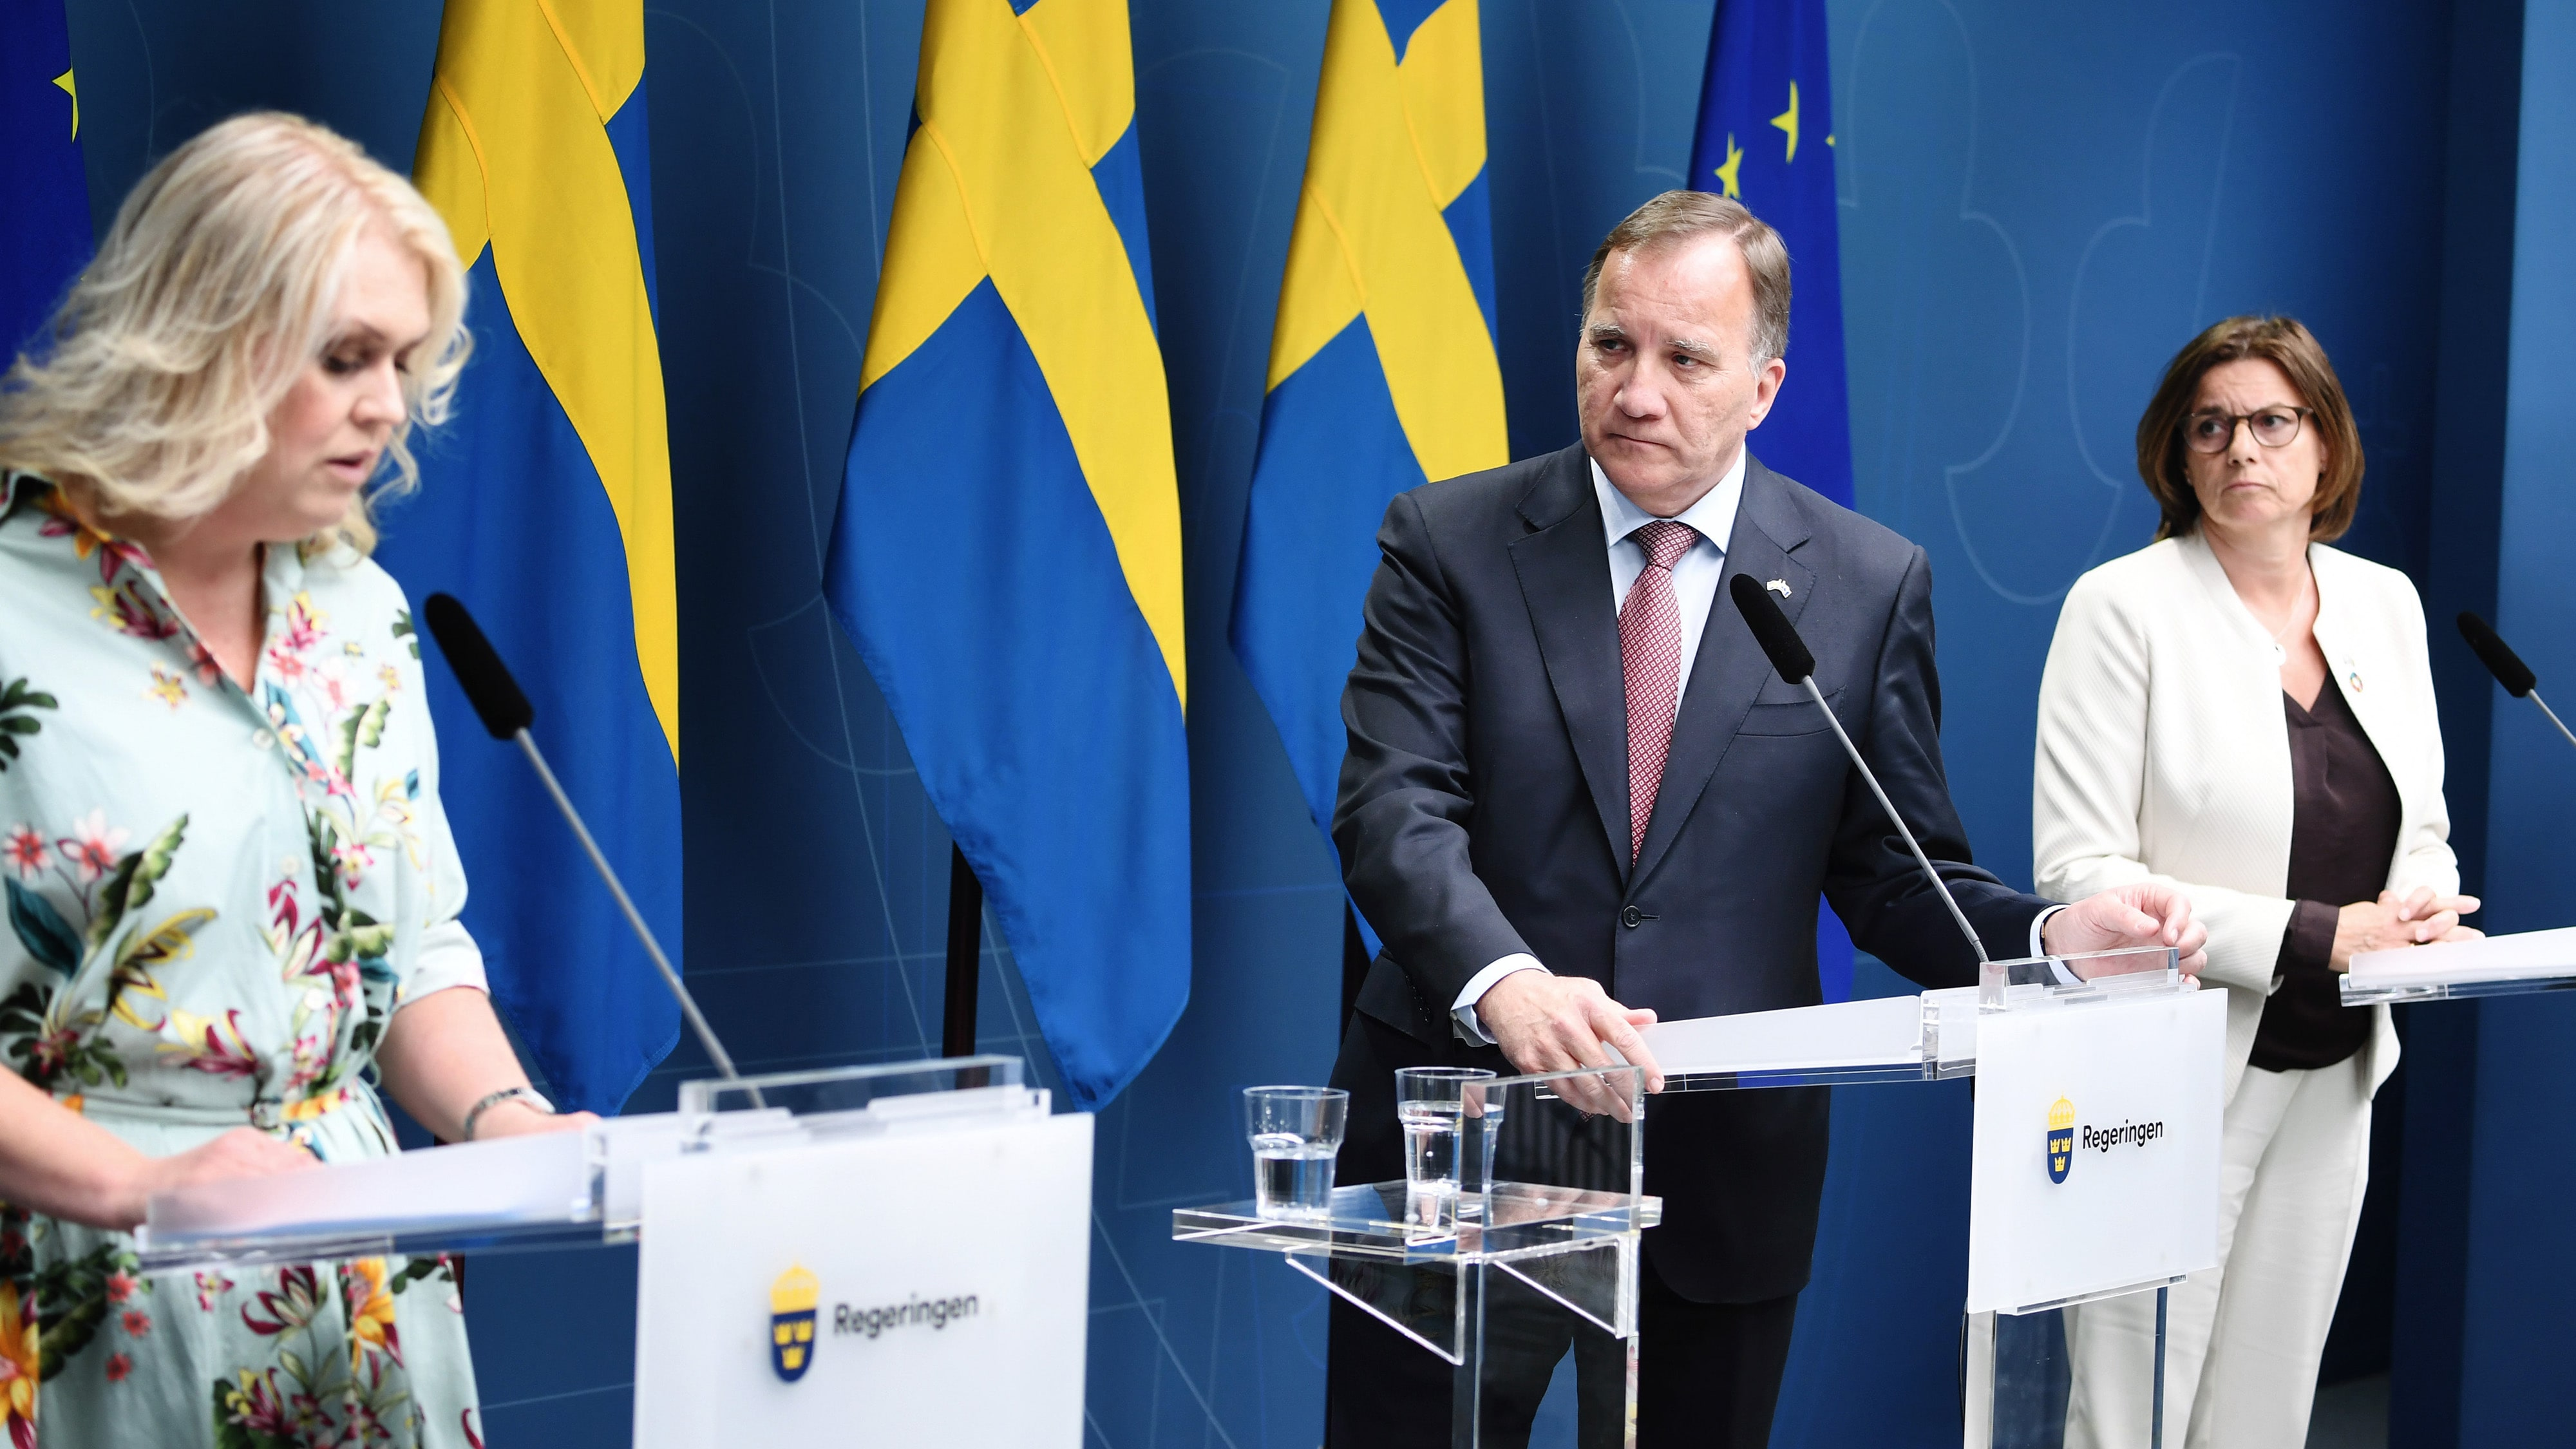 Corona Fria Resor For Friska Inom Sverige I Sommar Dn Se